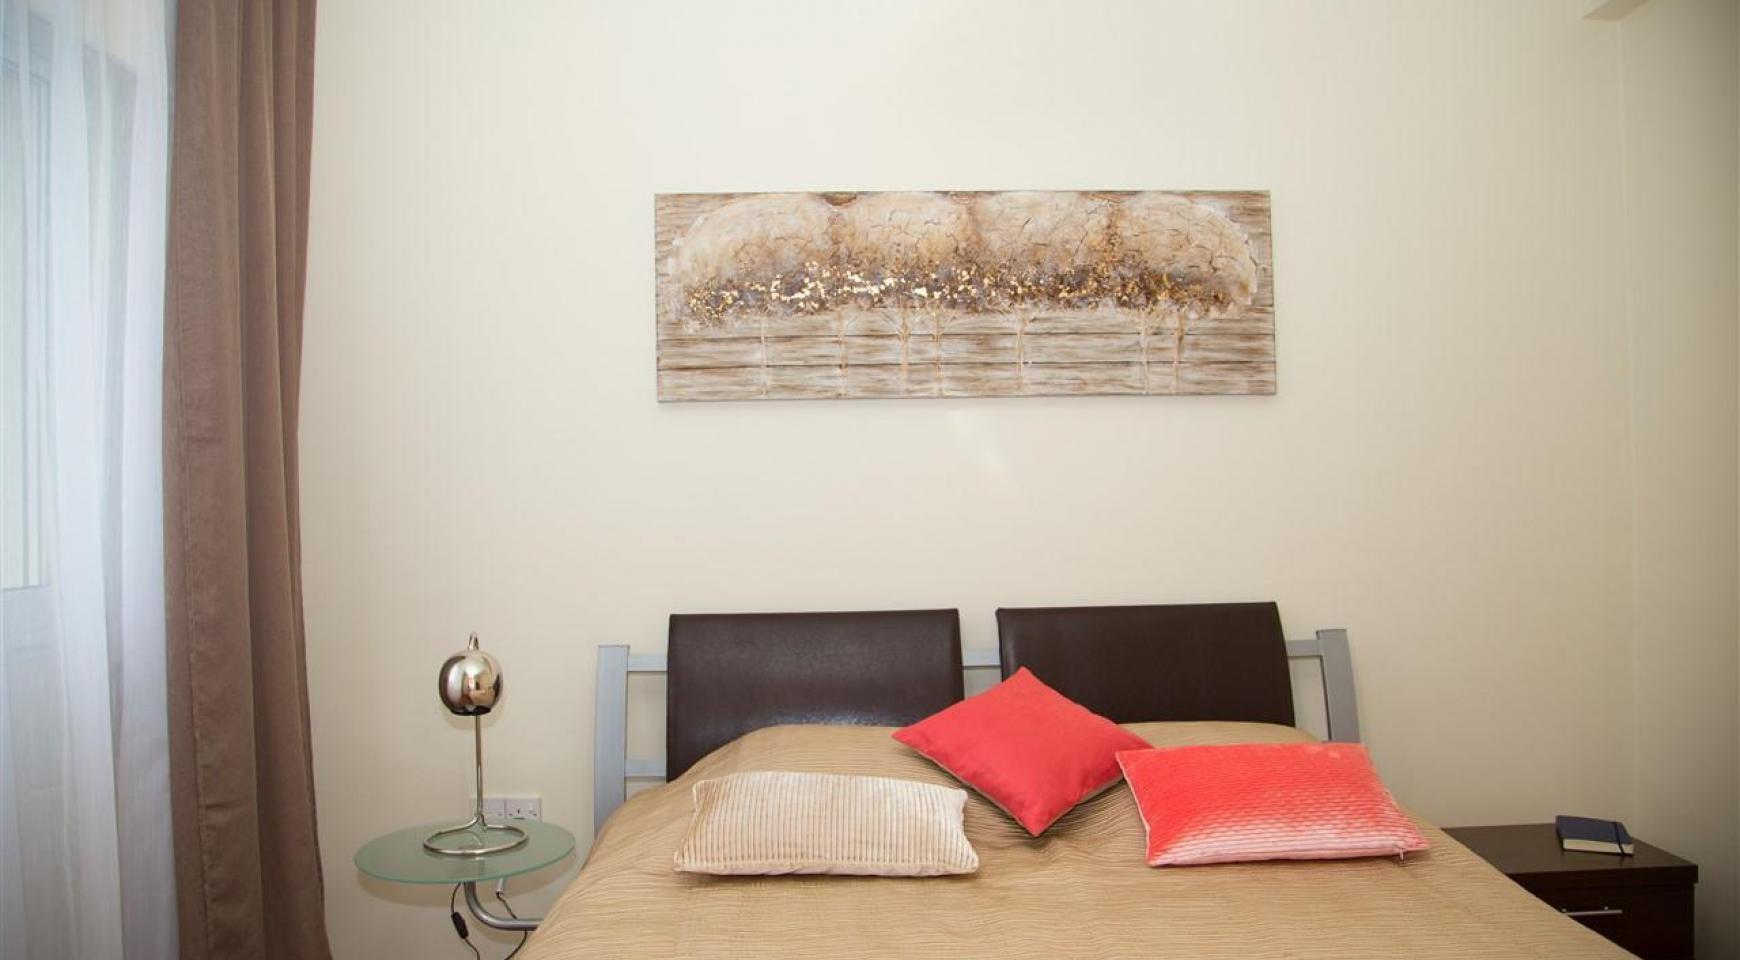 2 Bedroom Apartment Mesogios Iris 304 in the Complex near the Sea - 20